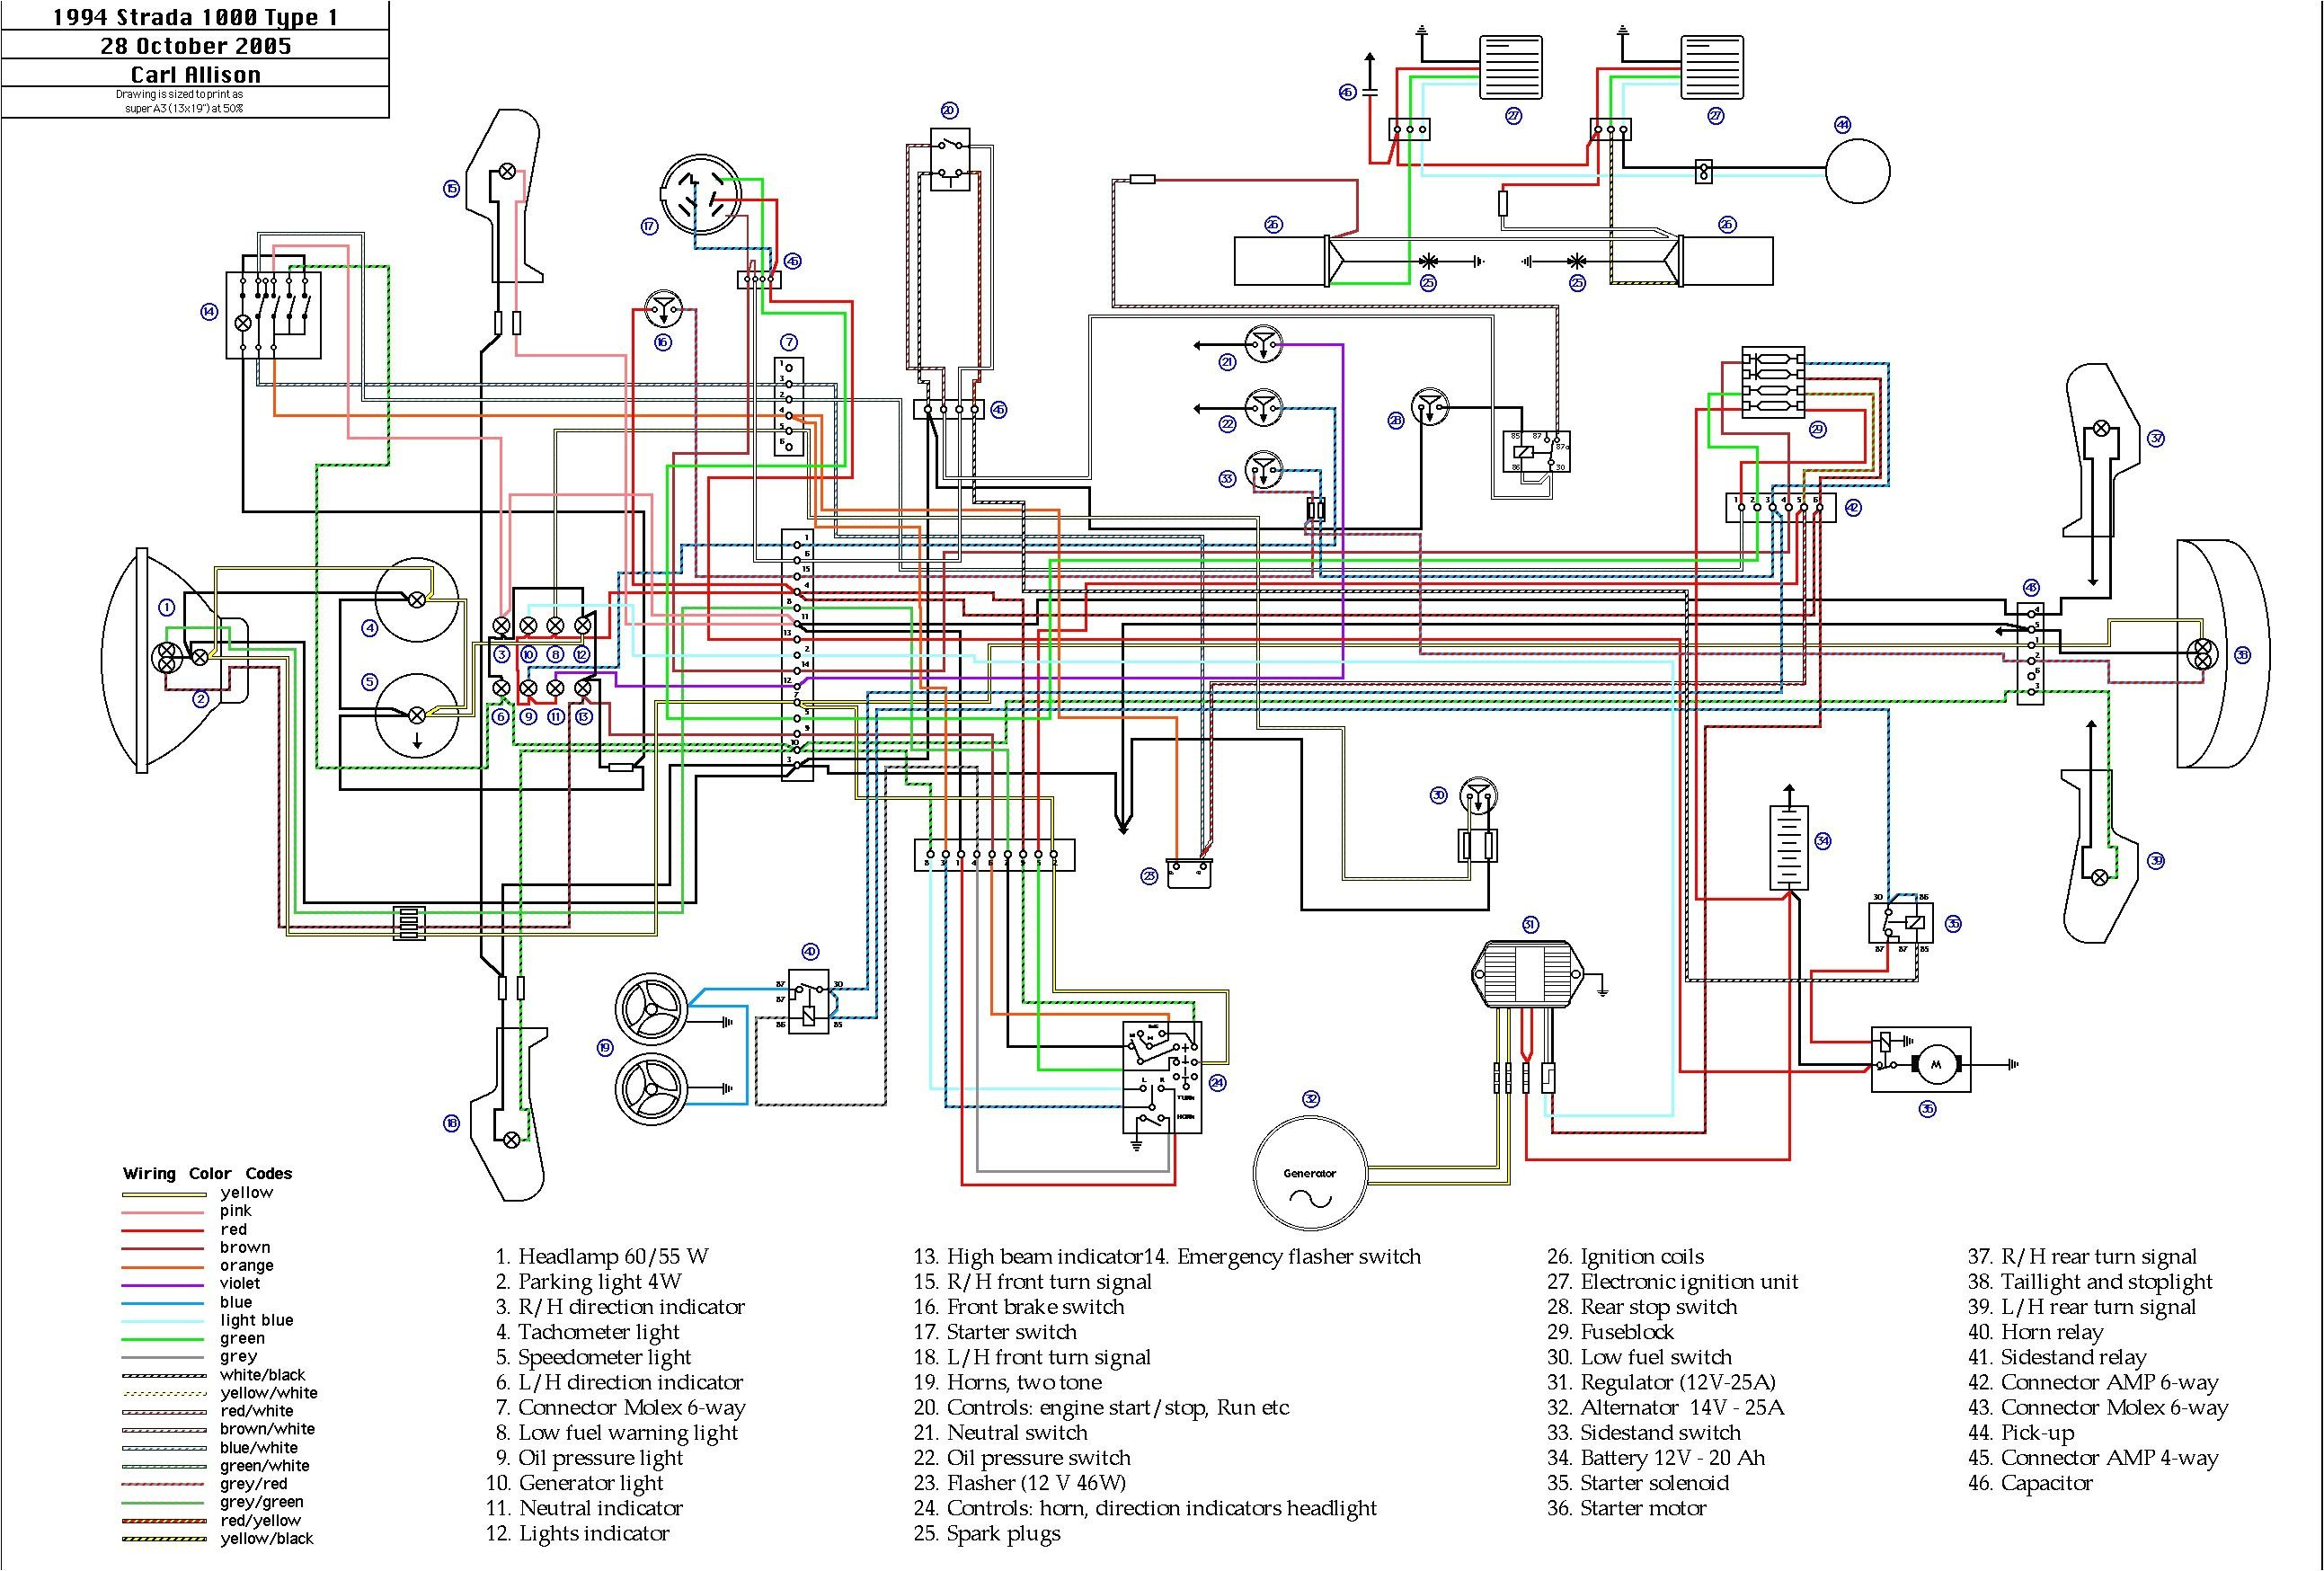 vauxhall corsa stereo wiring diagram wiring diagram for you corsa c stereo wiring diagram corsa c stereo wiring diagram